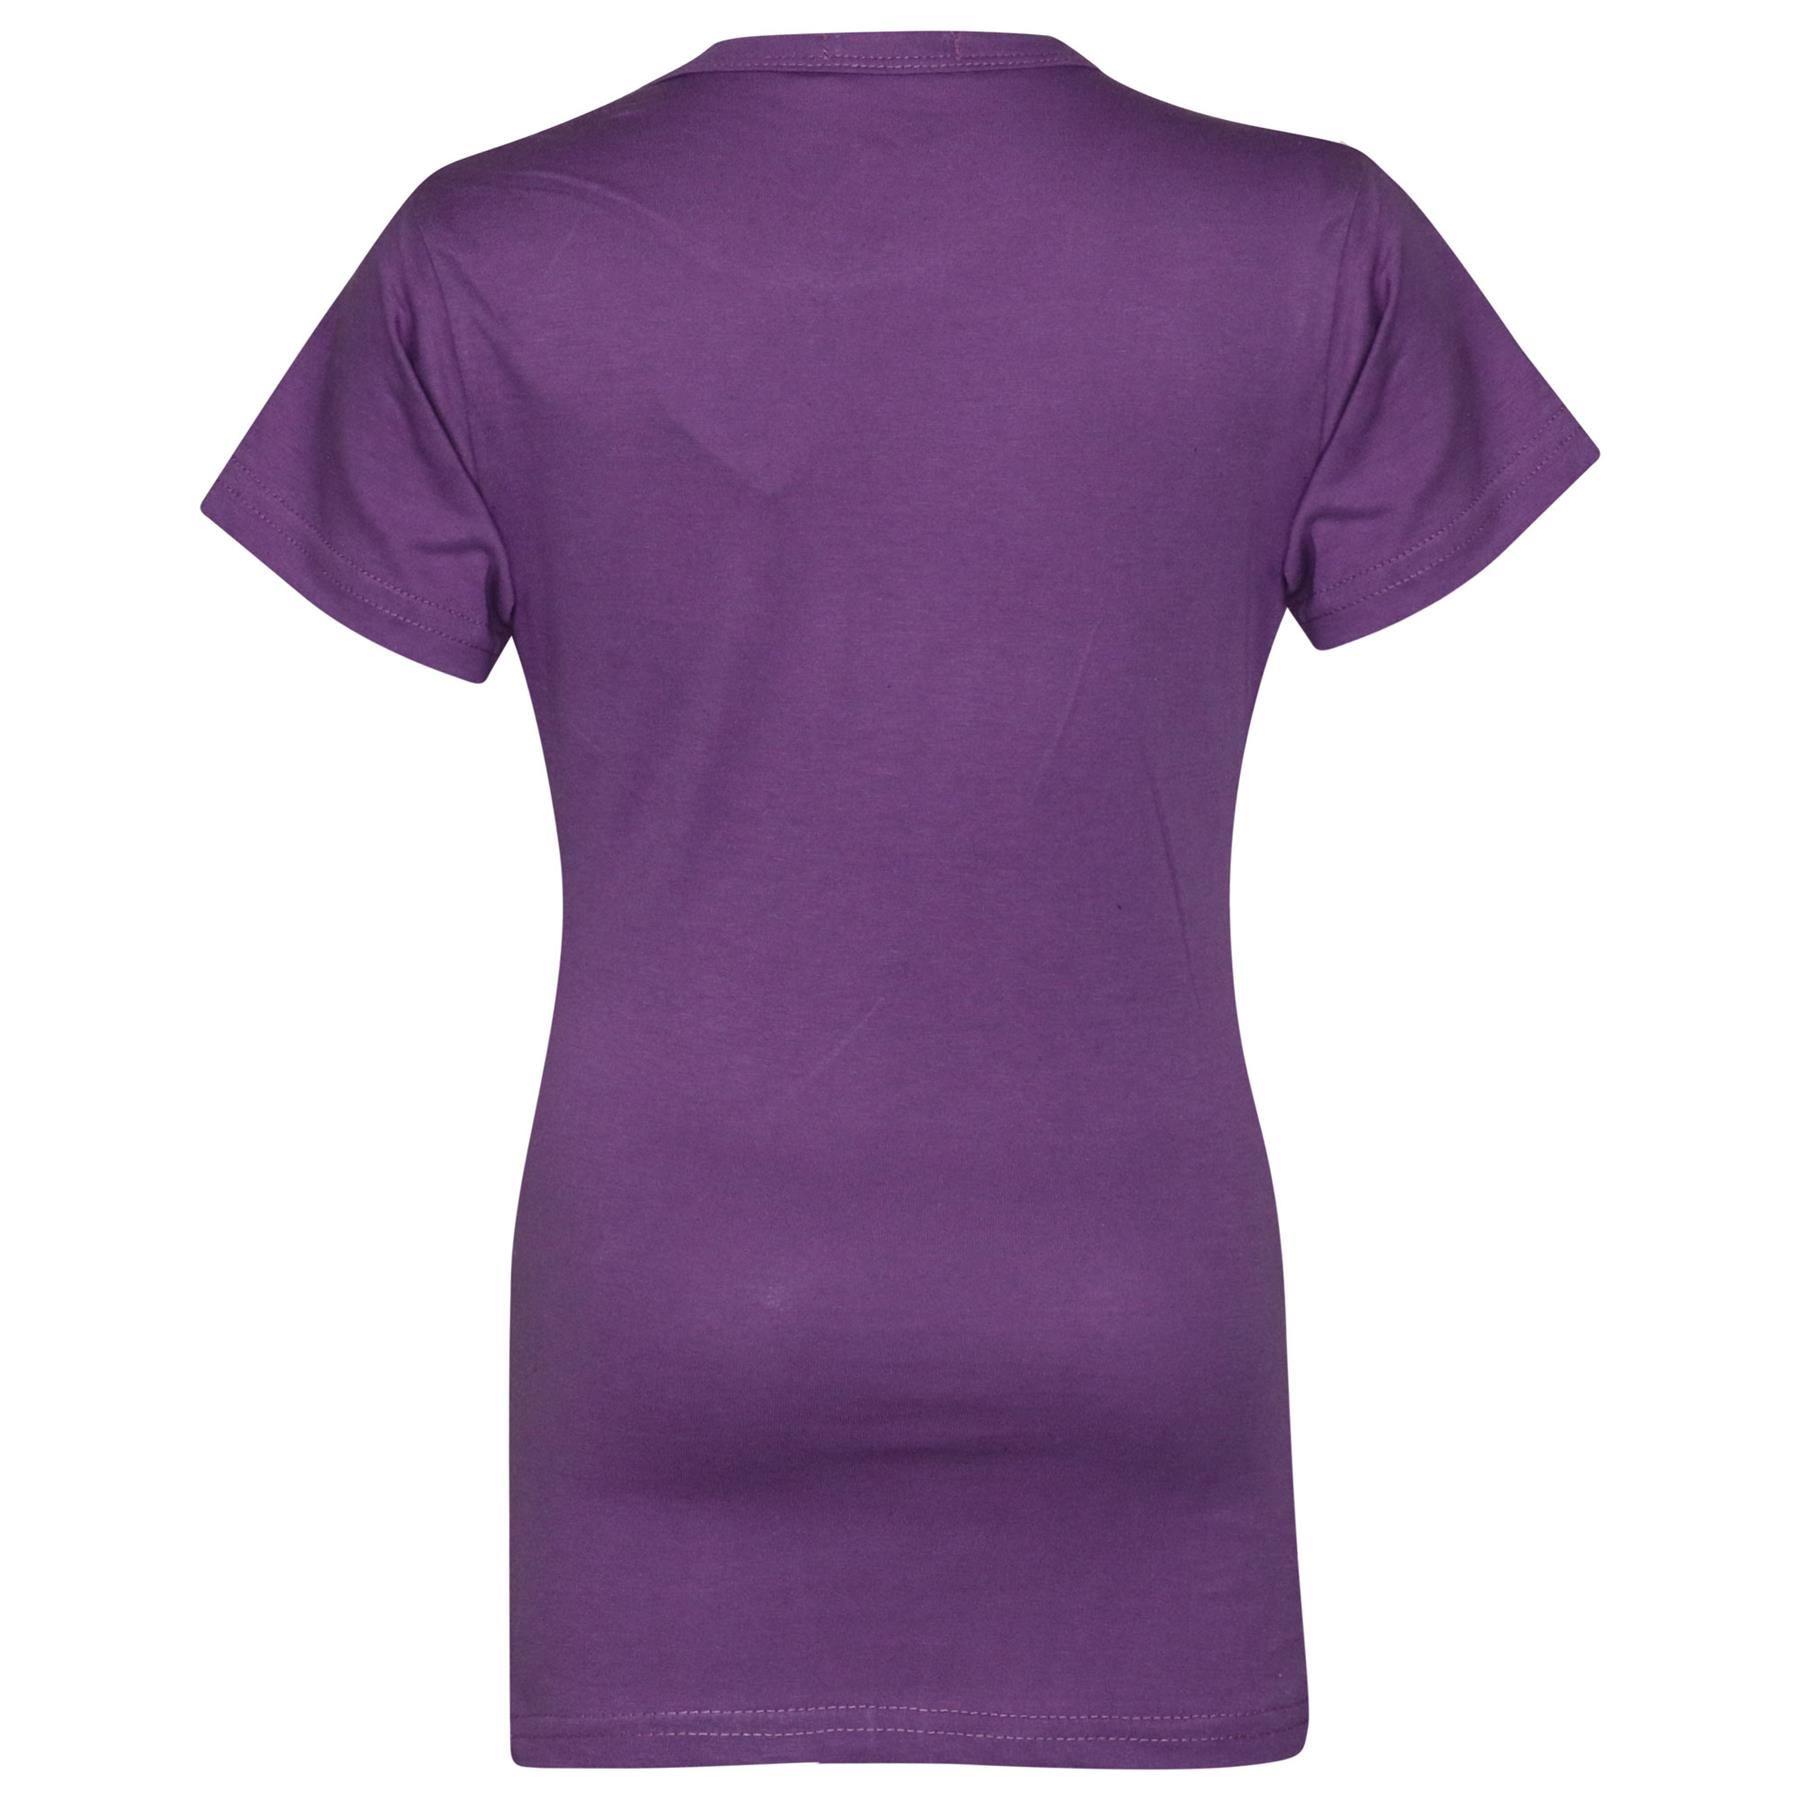 Kids-Girls-T-Shirts-Designer-100-Cotton-Plain-School-T-Shirt-Top-New-Age-3-13Yr thumbnail 21